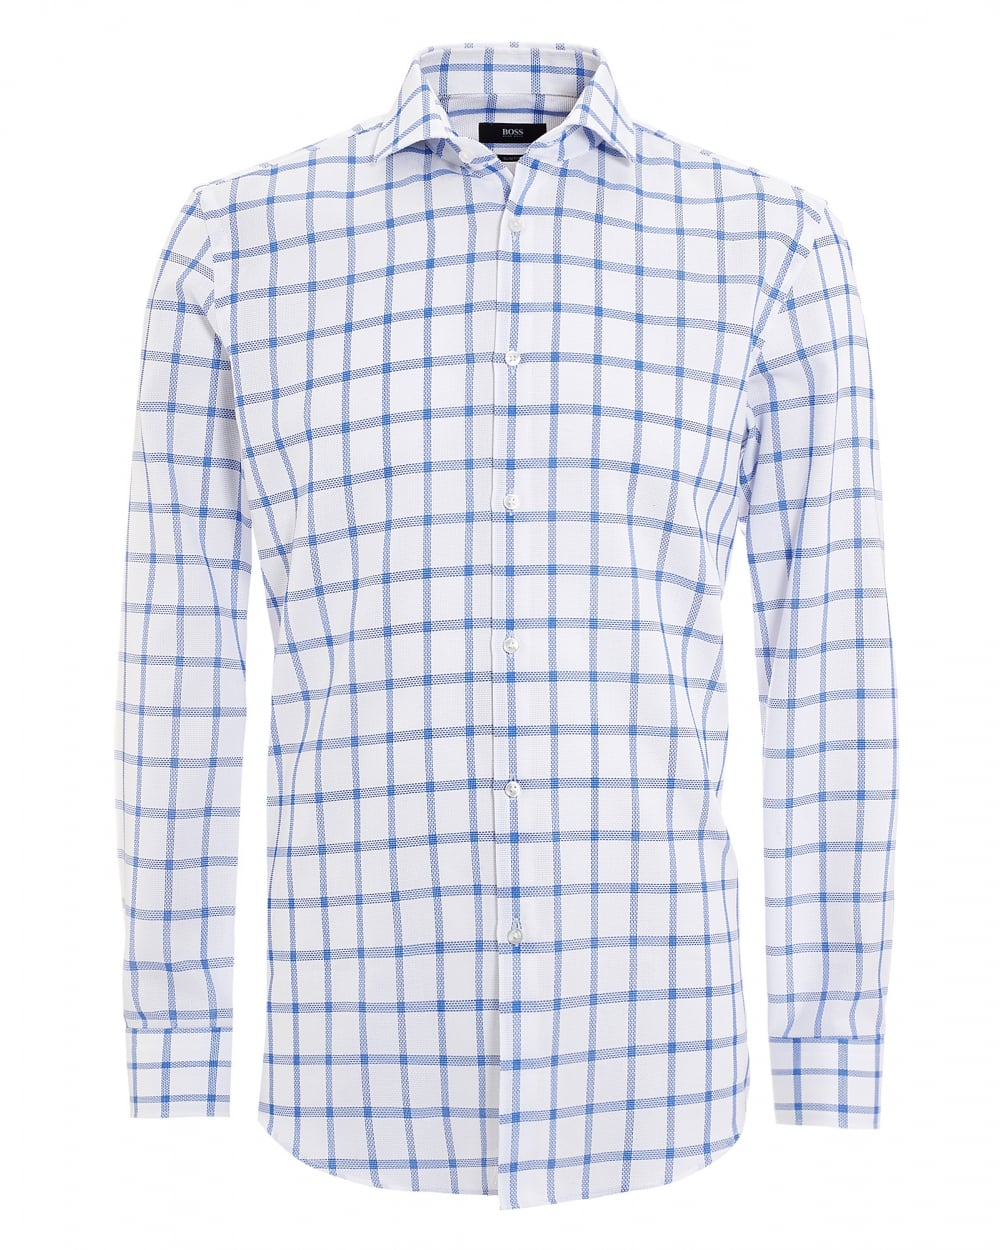 b3228a01d Hugo Boss Classic Mens Jason Shirt, Window Pane White Royal Shirt